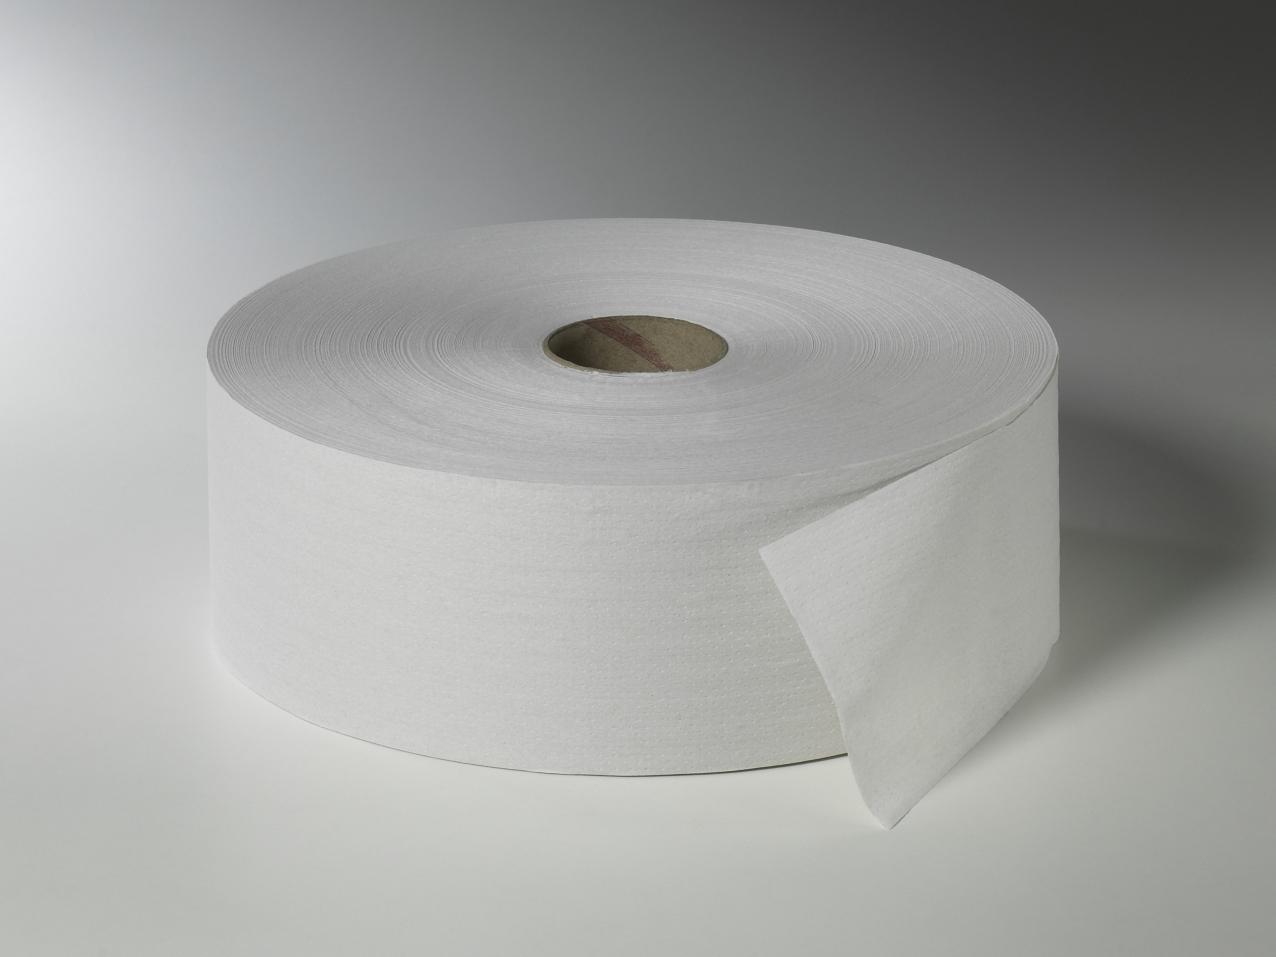 Fripa - Toilettenpapier maxi, 2-lagig, 380 m, nicht perforiert (6 Rl.)